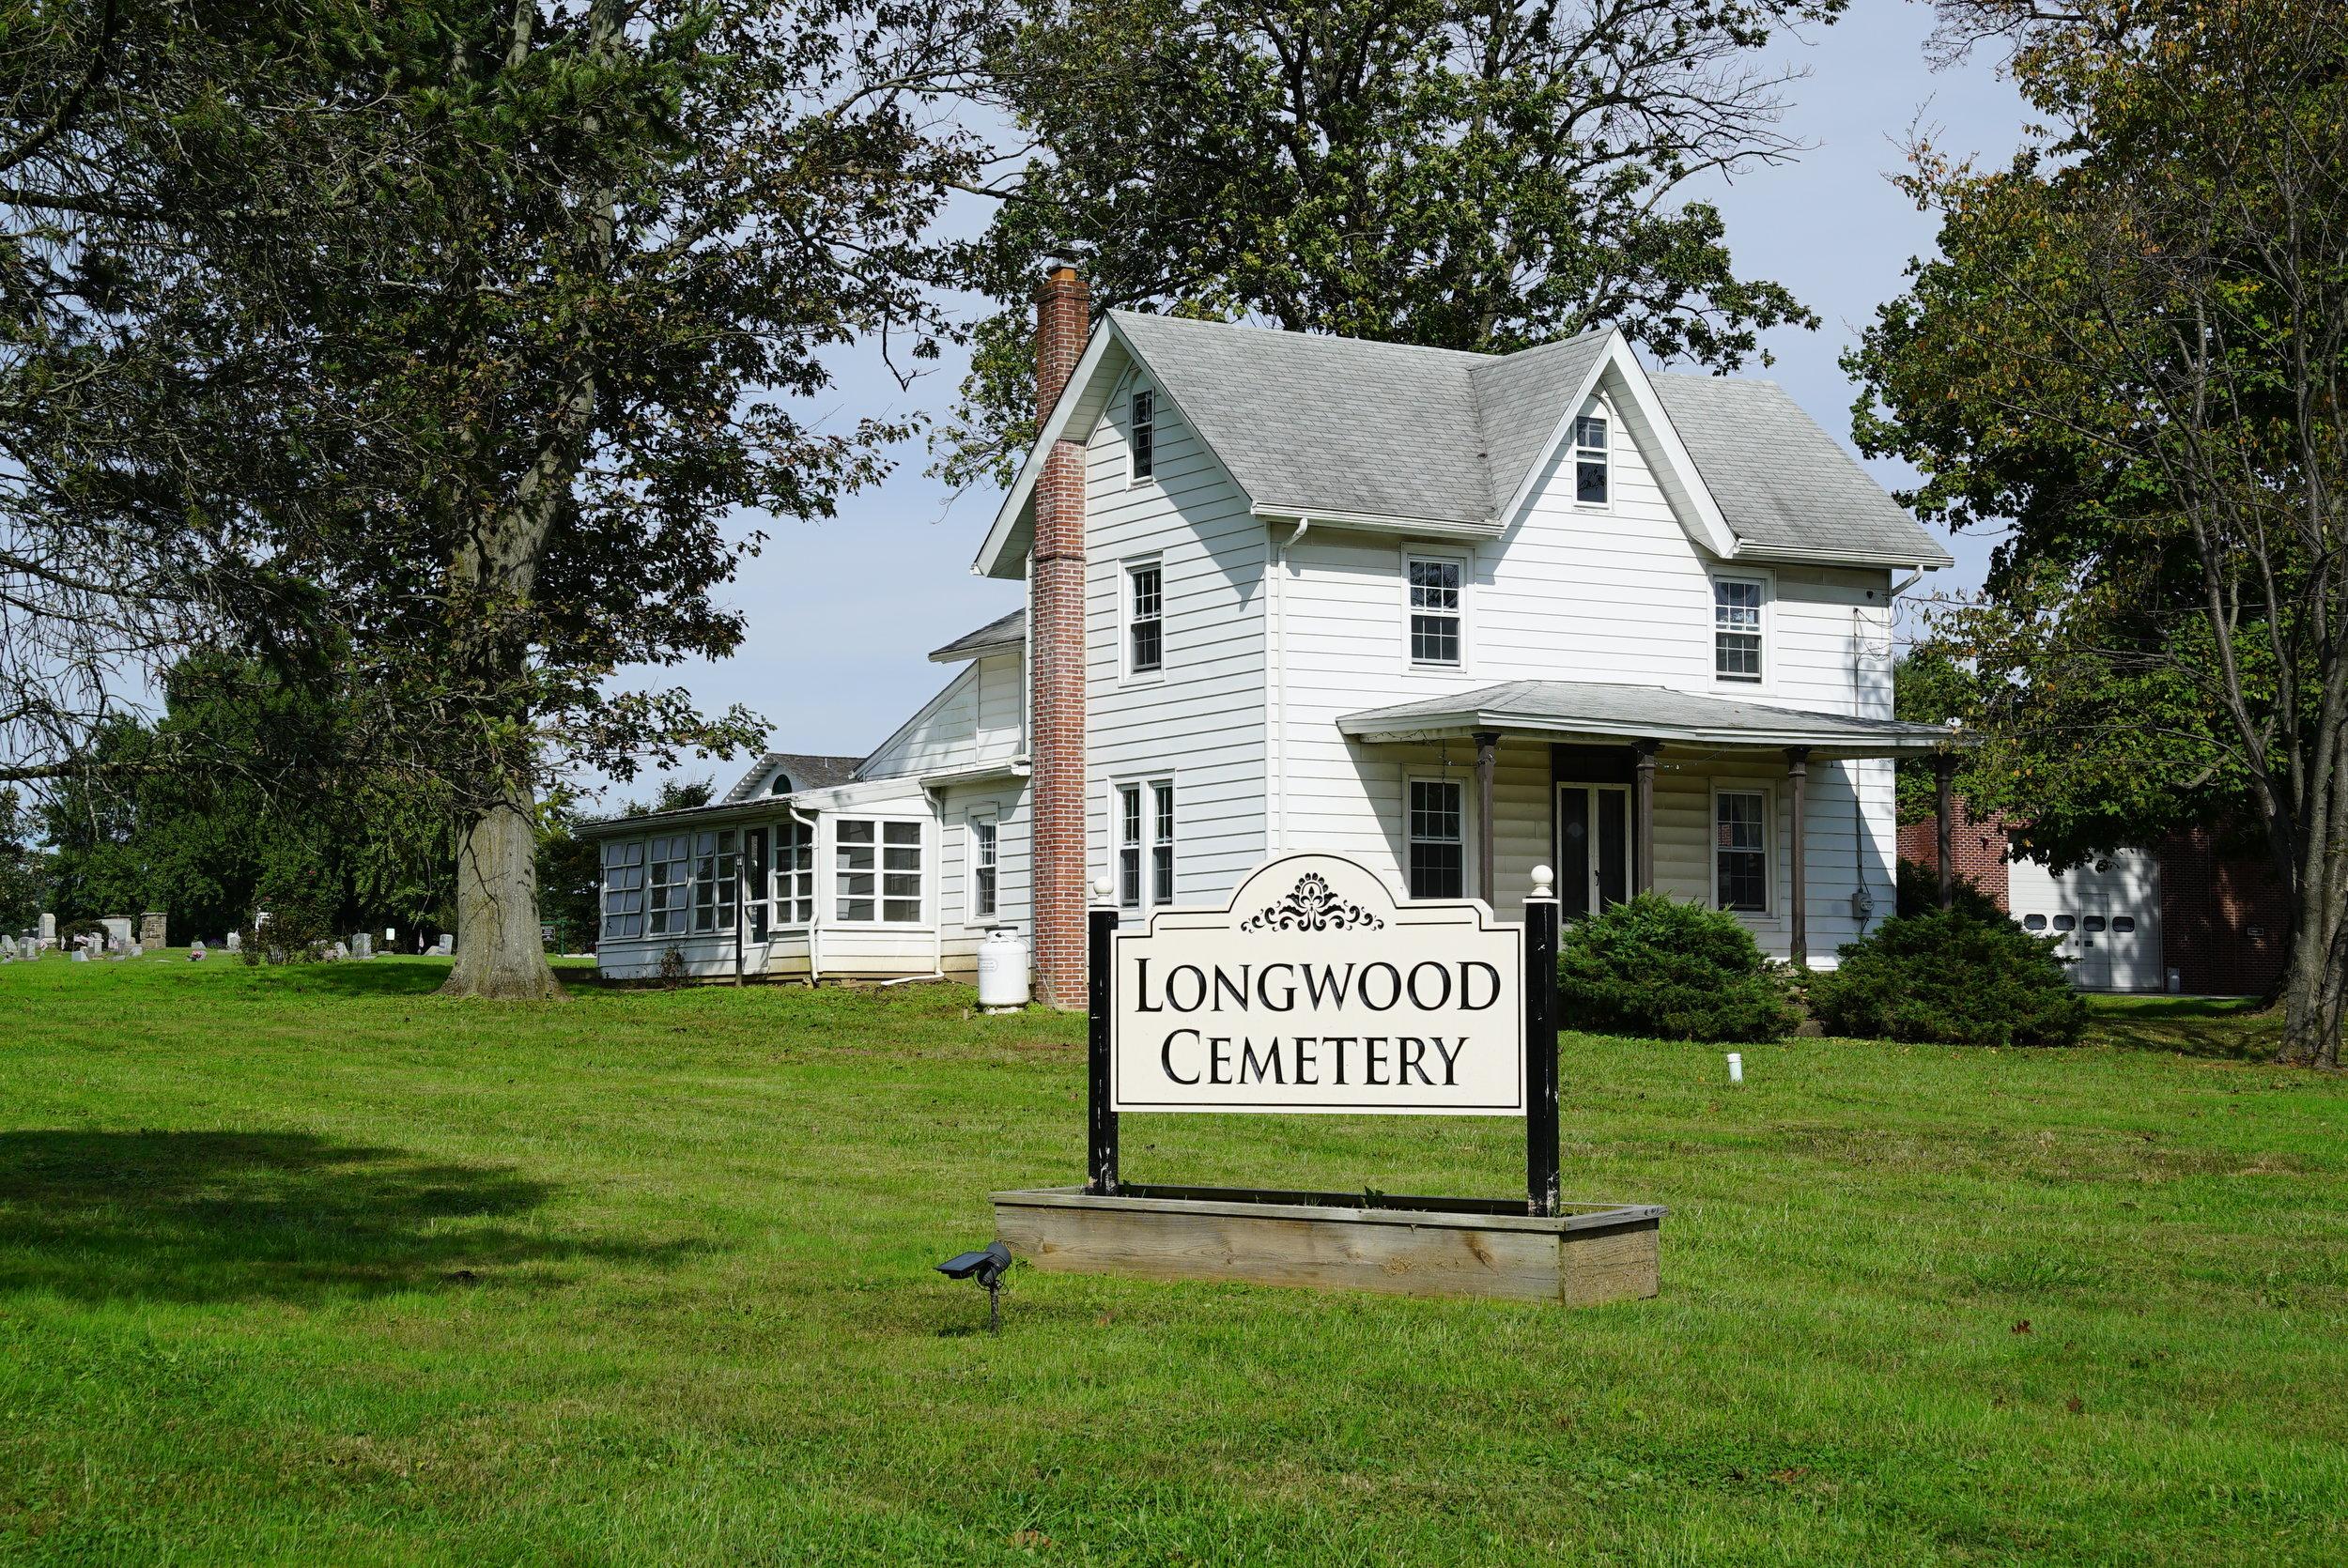 The caretaker's house. Longwood Cemetery.